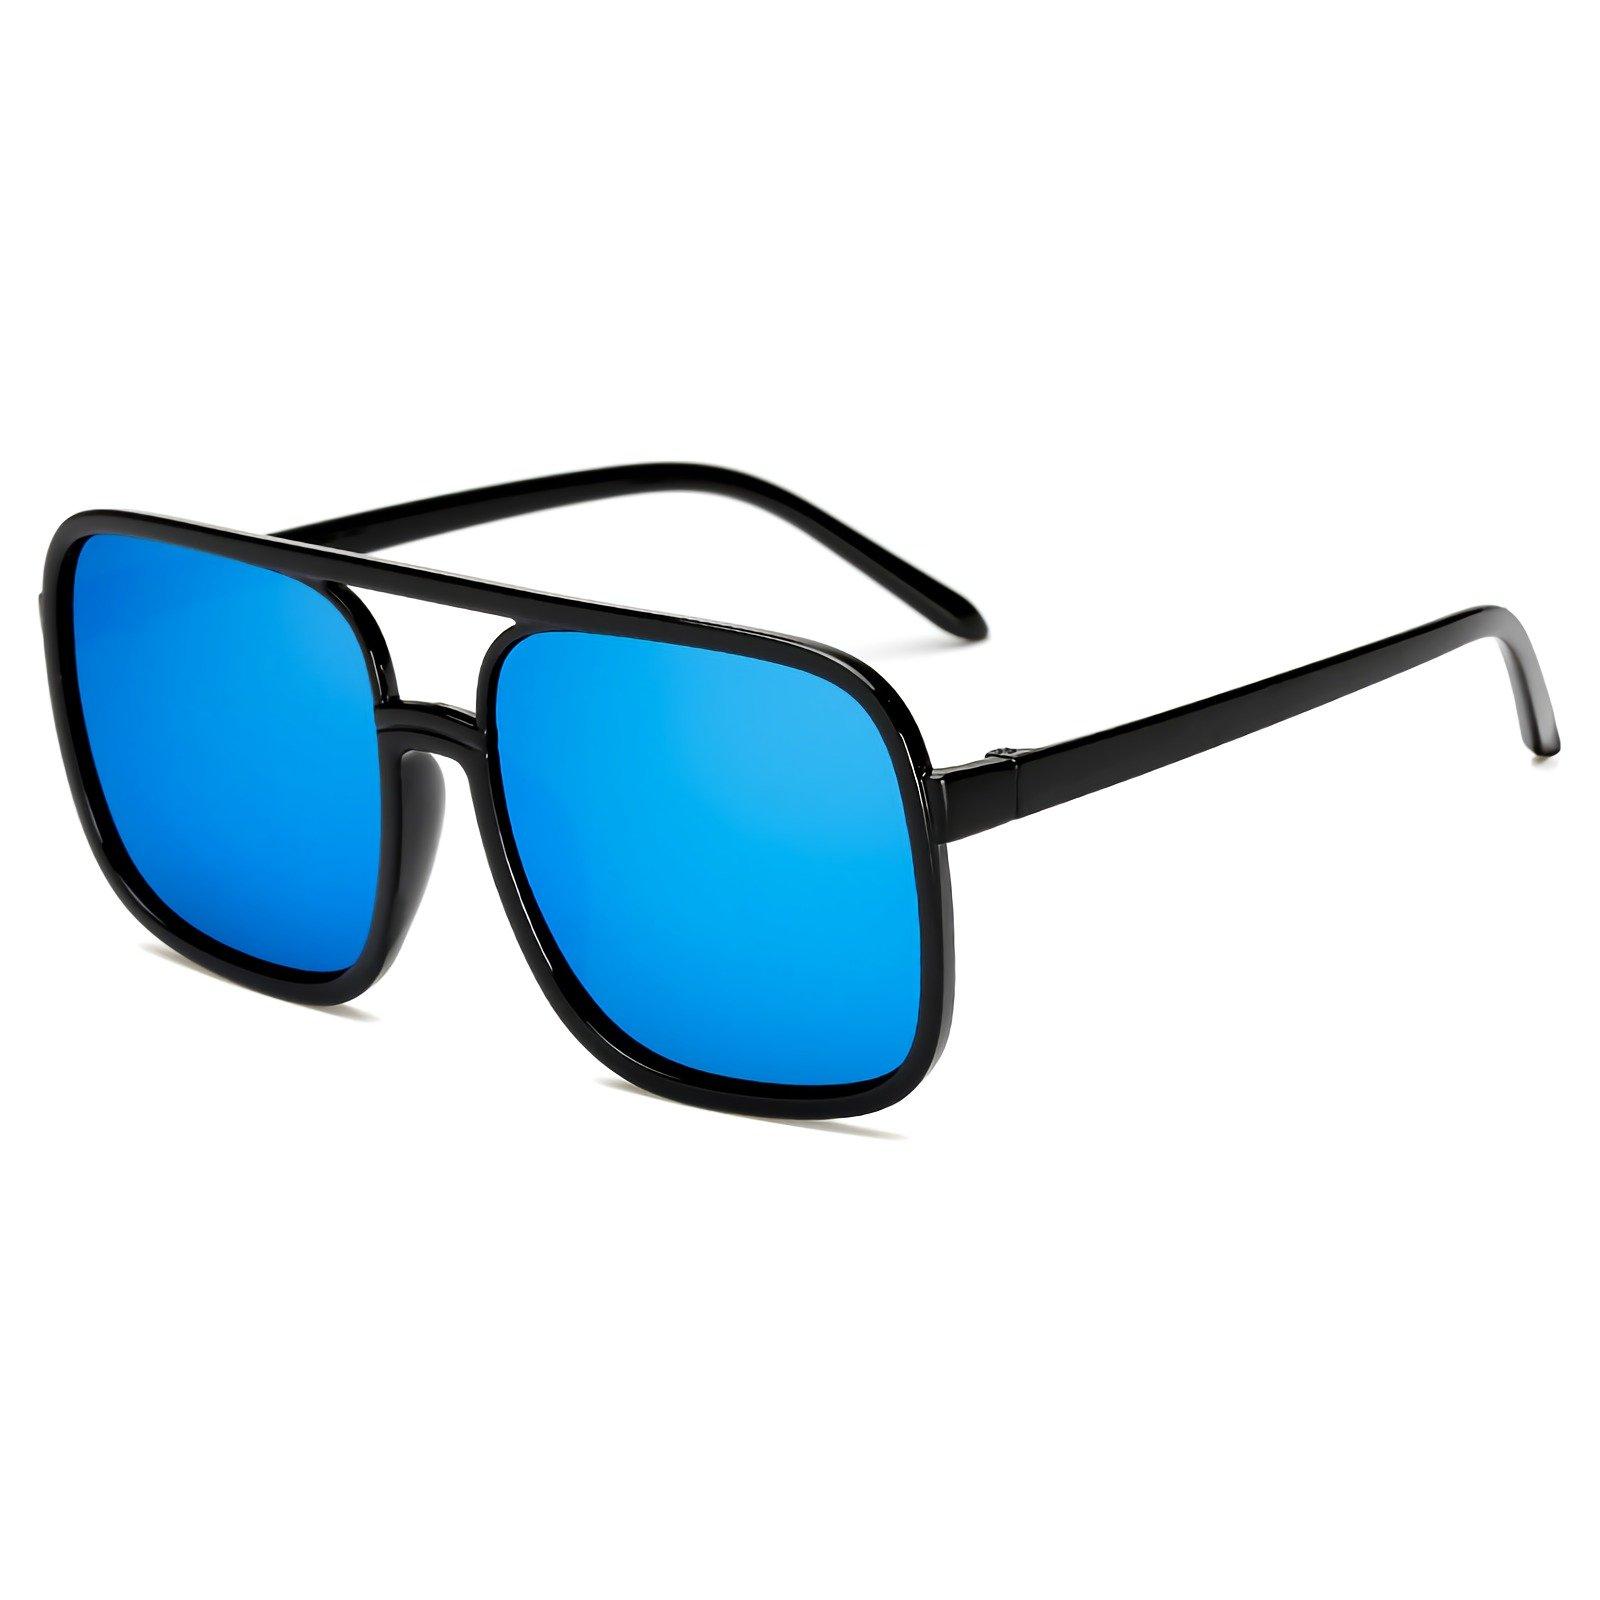 Super Oversized Square Frame Blue Lens Fashion Glasses Eyeglasses